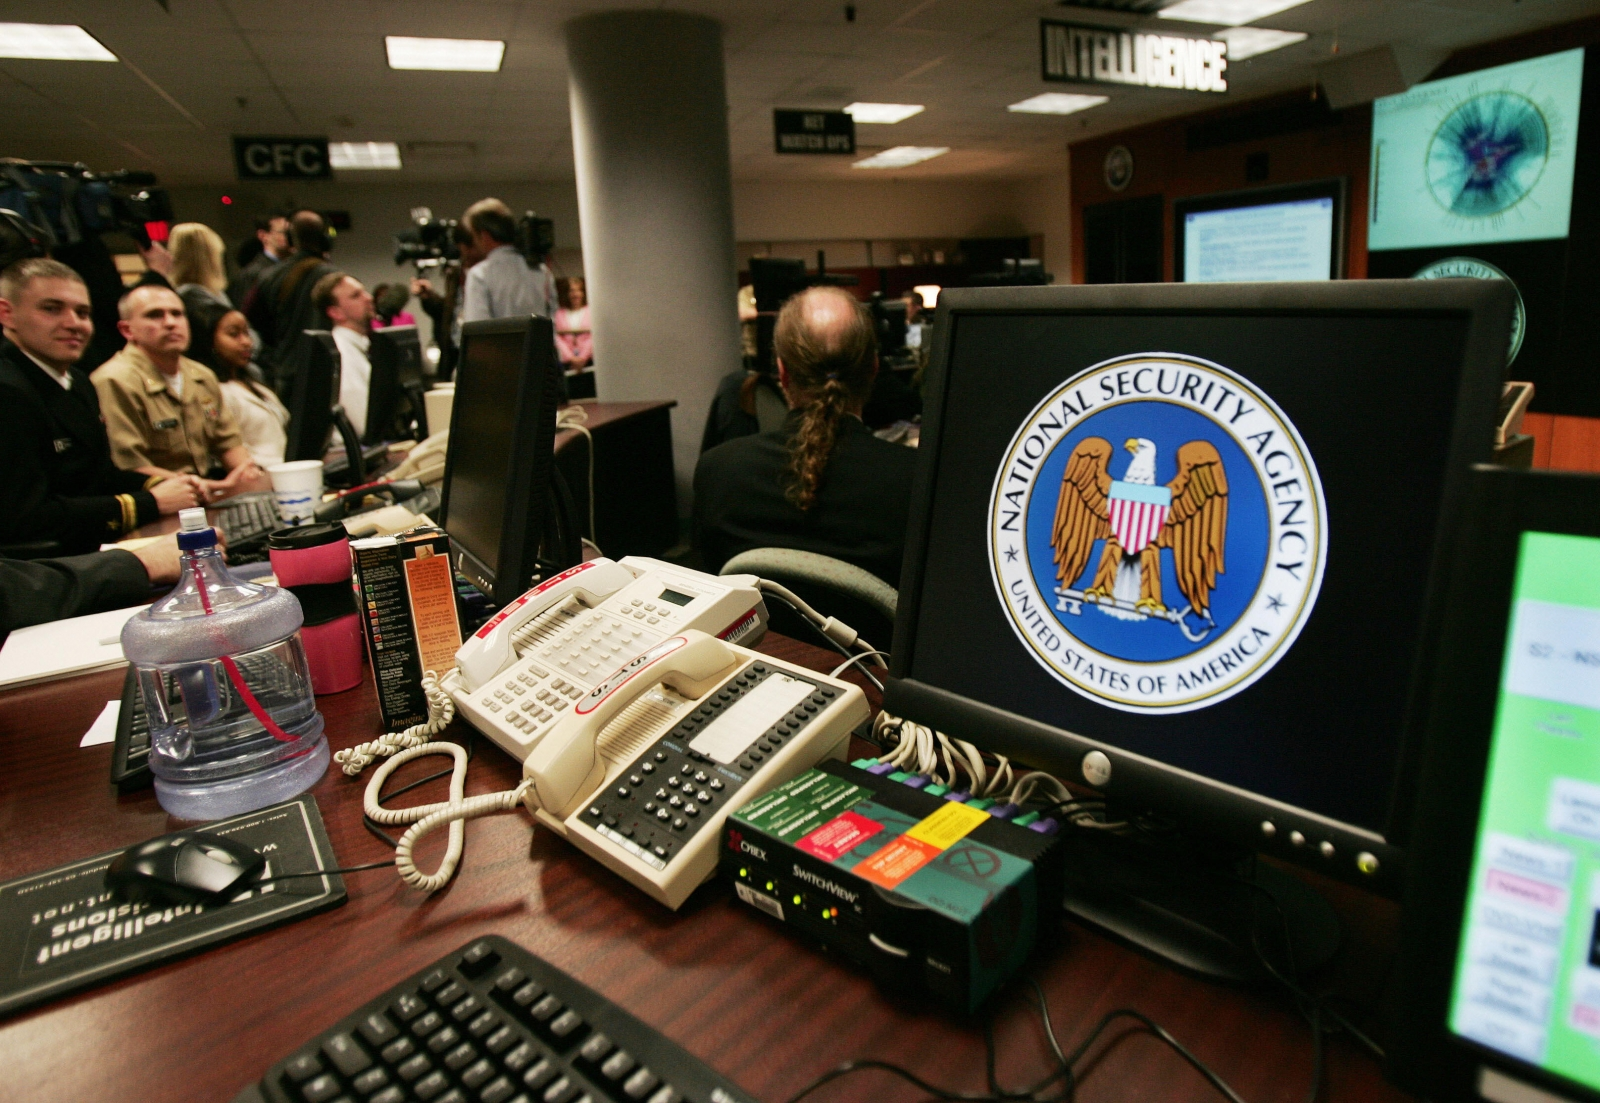 NSA workstation